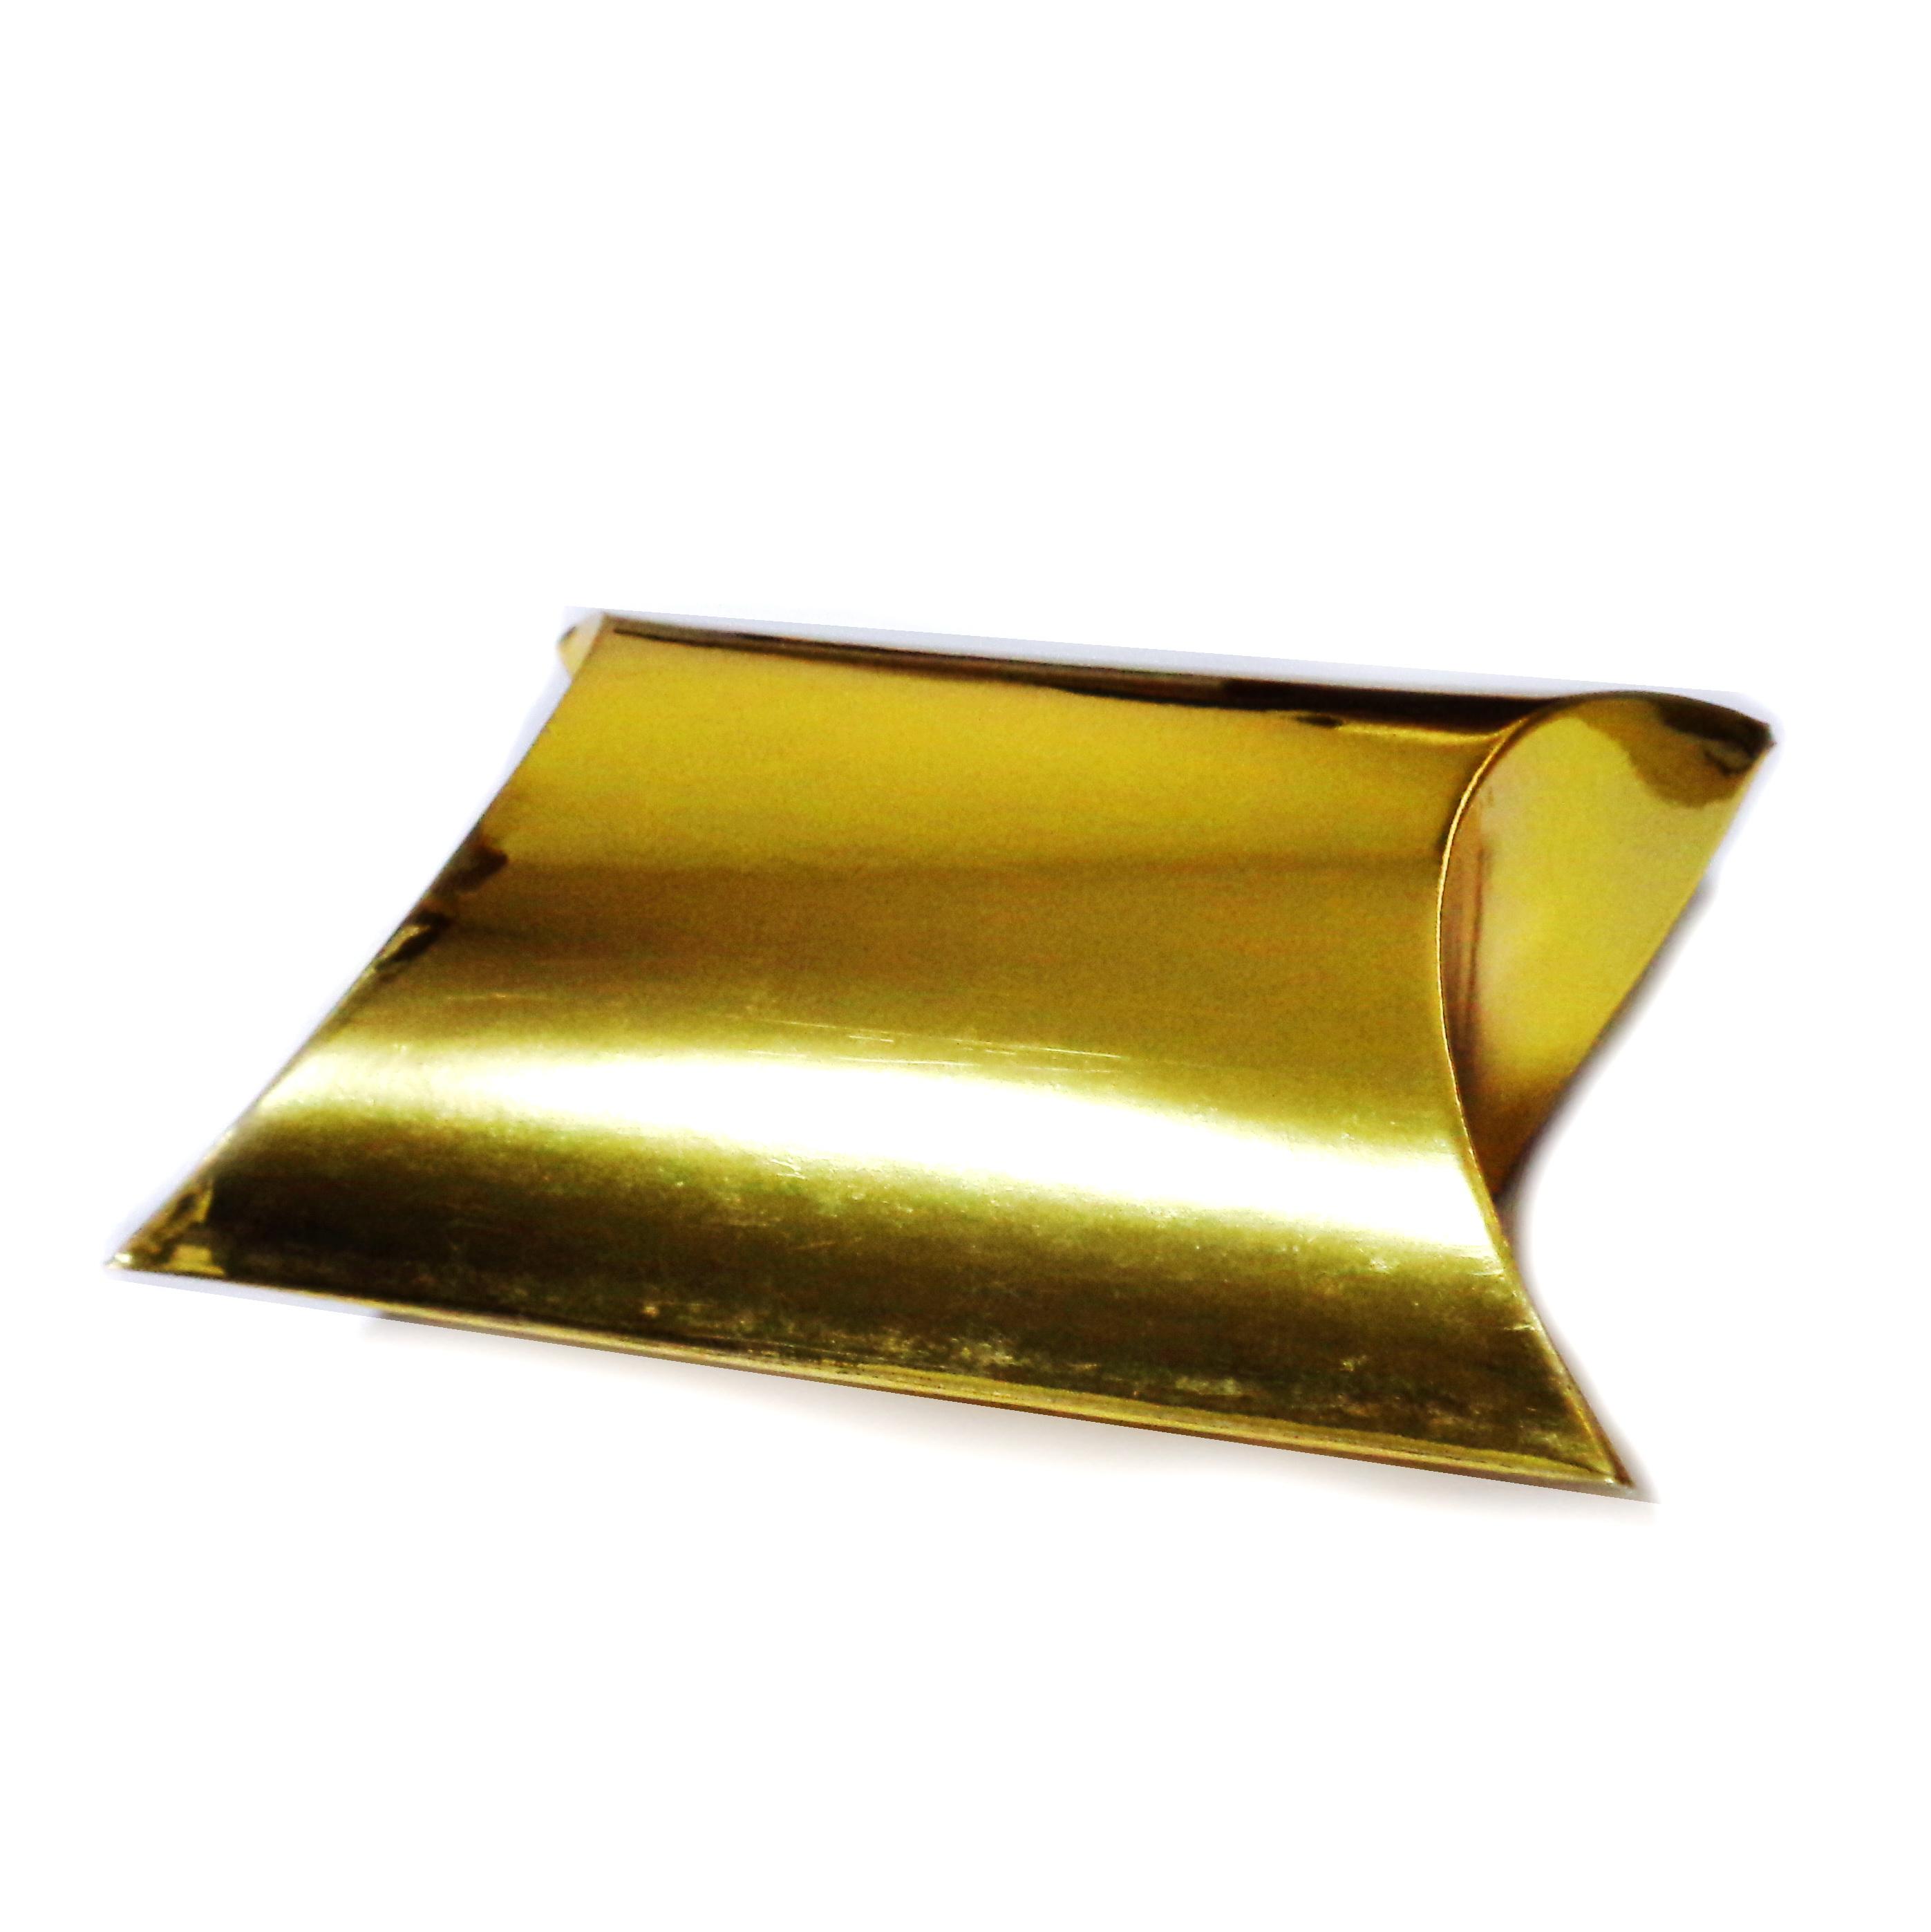 Cutie cadou carton auriu, perna, 9x10x3.5cm 1 buc